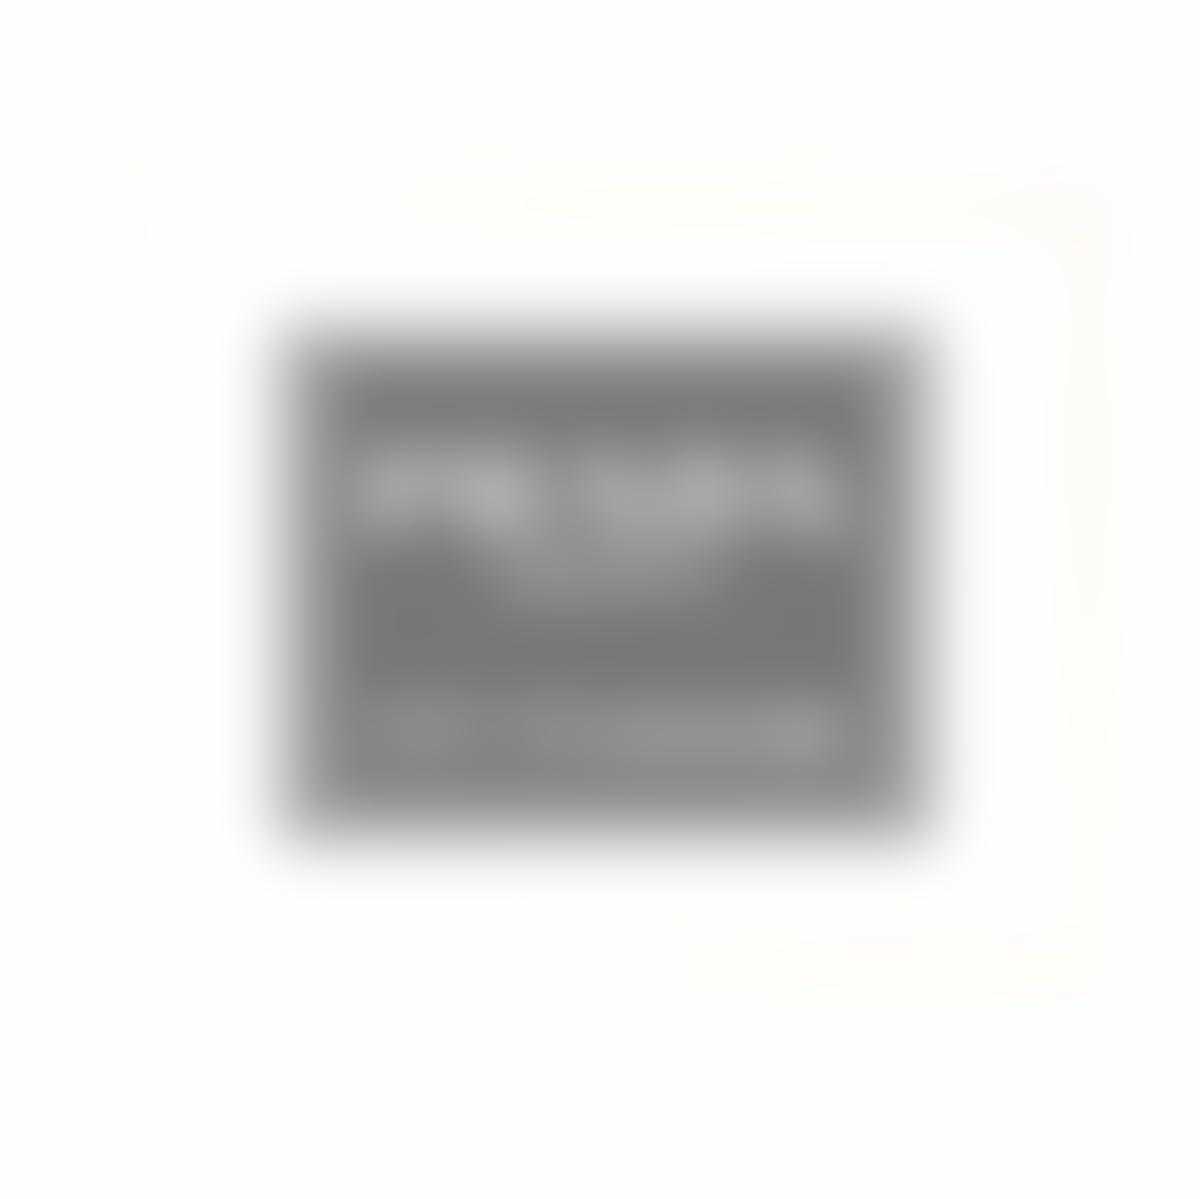 Amazon.com: Print Prada Marfa distance like Gossip Girl Fashion Color Black and White poster 0065: Handmade